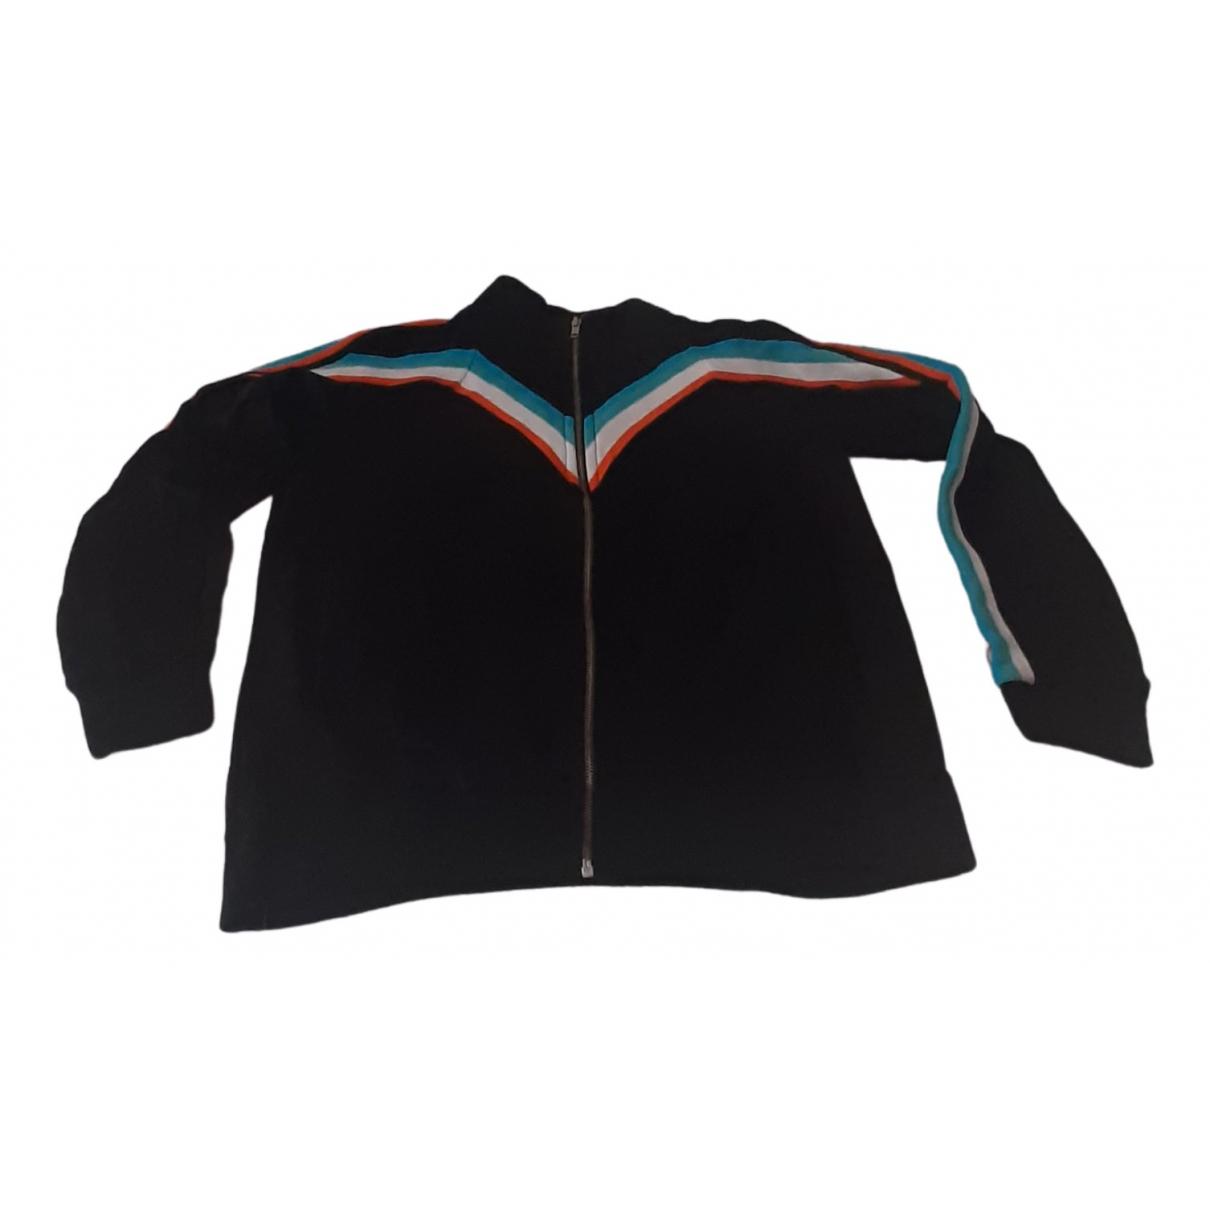 Maje Fall Winter 2019 Black Cotton jacket for Women 3 0-5